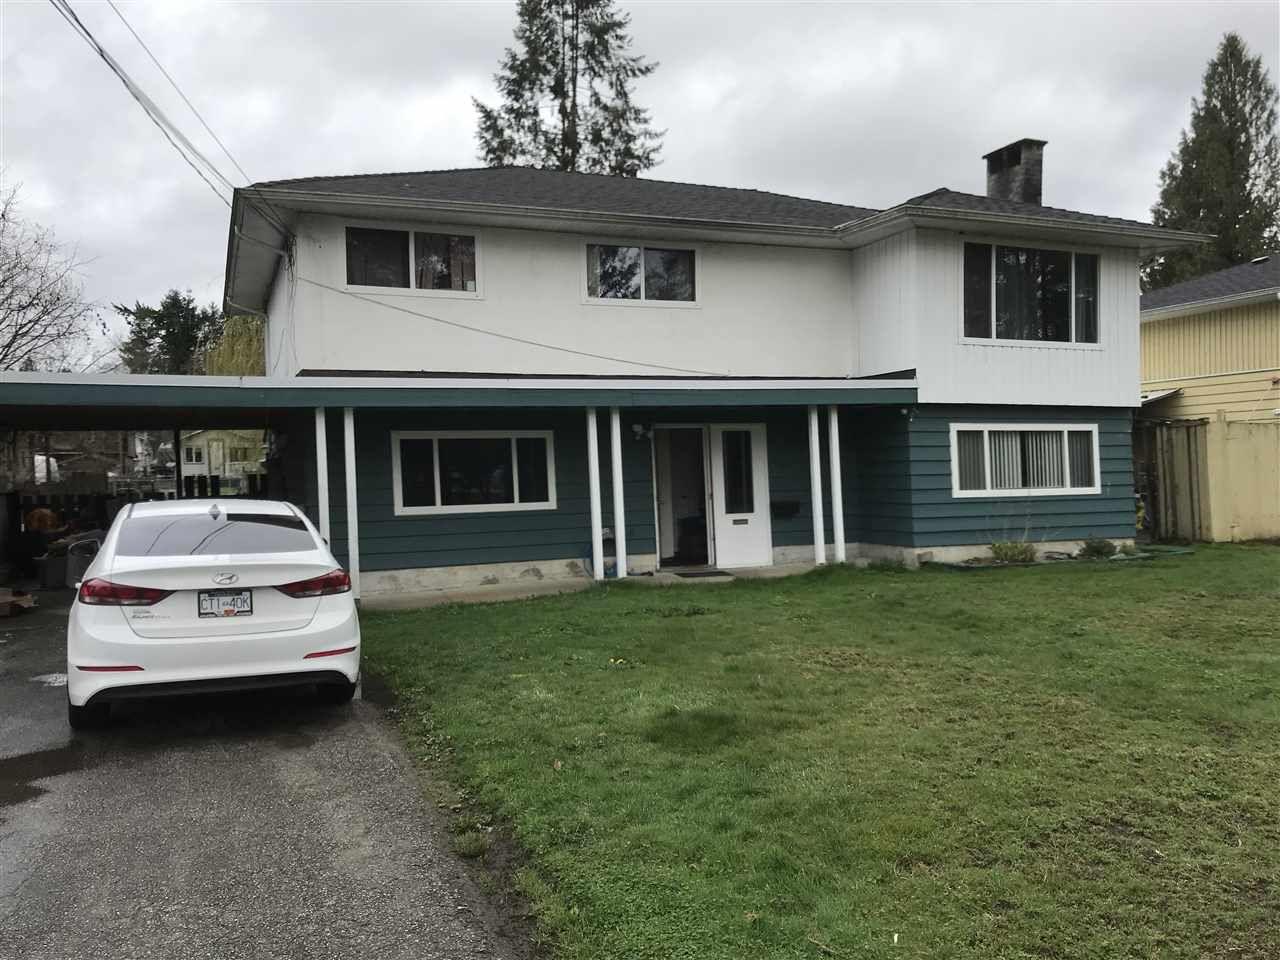 Main Photo: 3757 CEDAR Drive in Port Coquitlam: Lincoln Park PQ House for sale : MLS®# R2255842